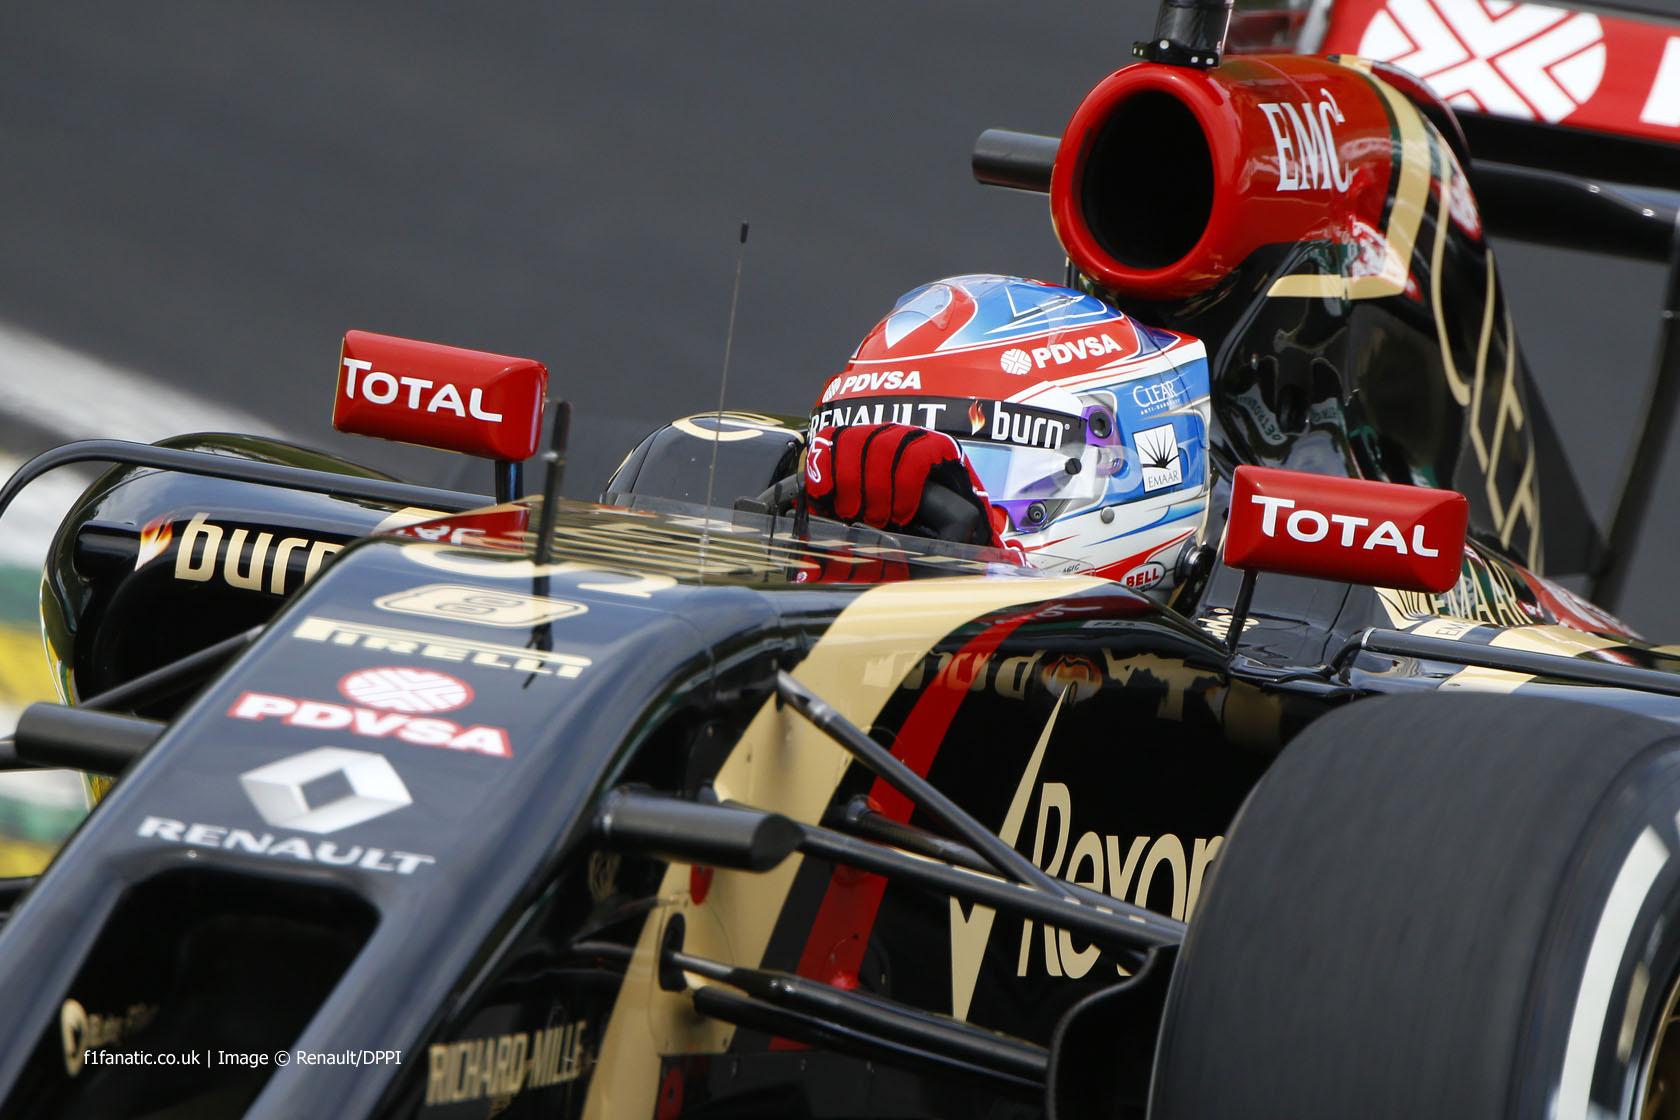 Romain Grosjean, Lotus, Interlagos, 2014